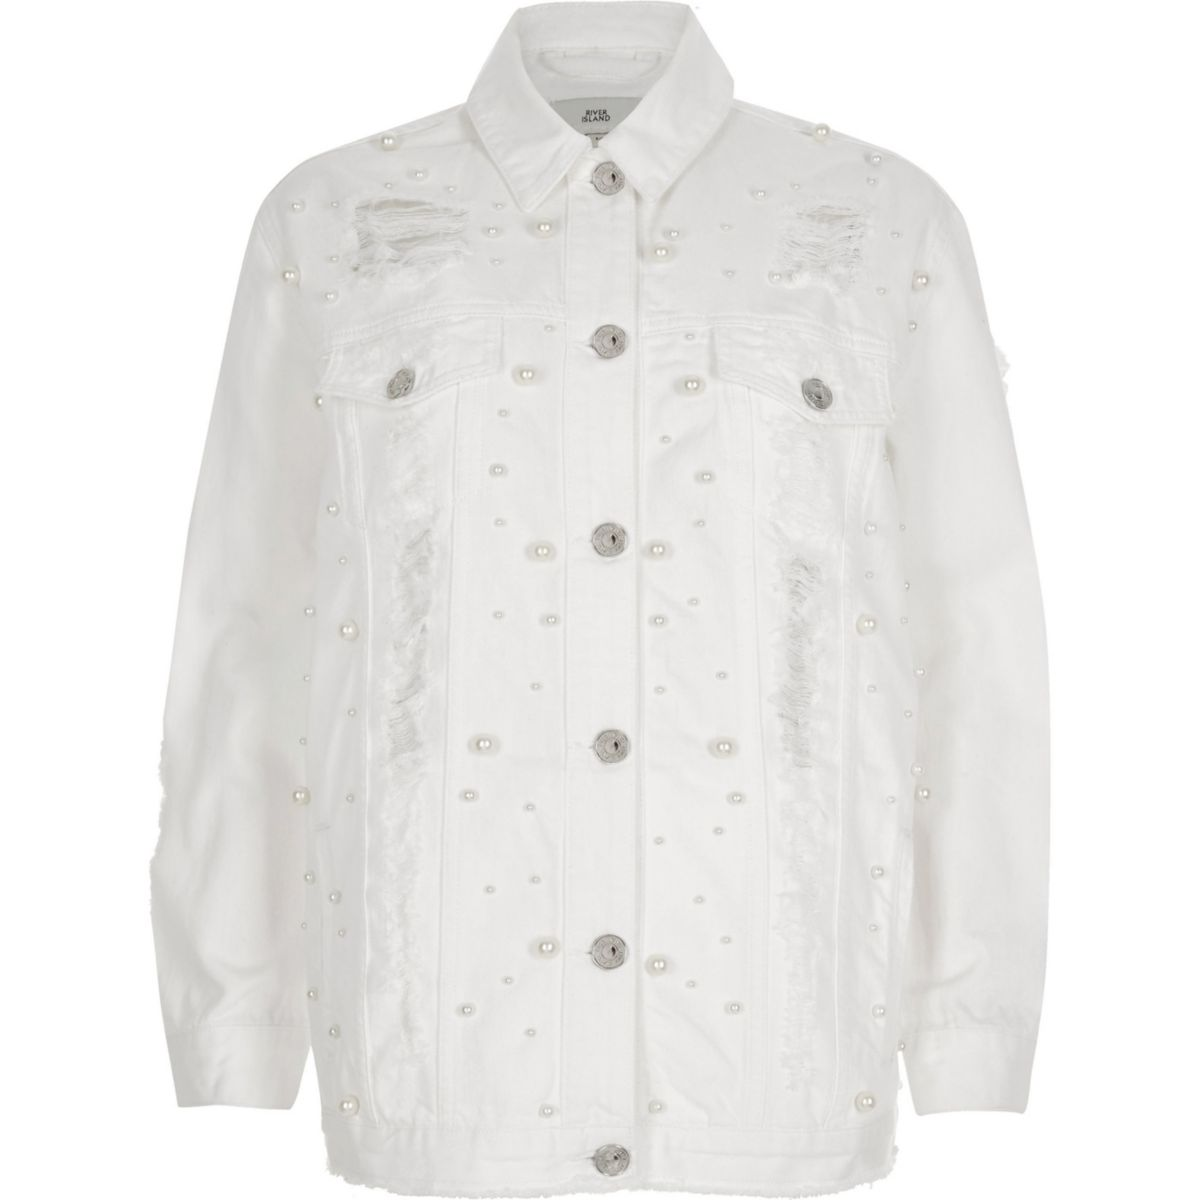 White peal ripped oversized denim jacket